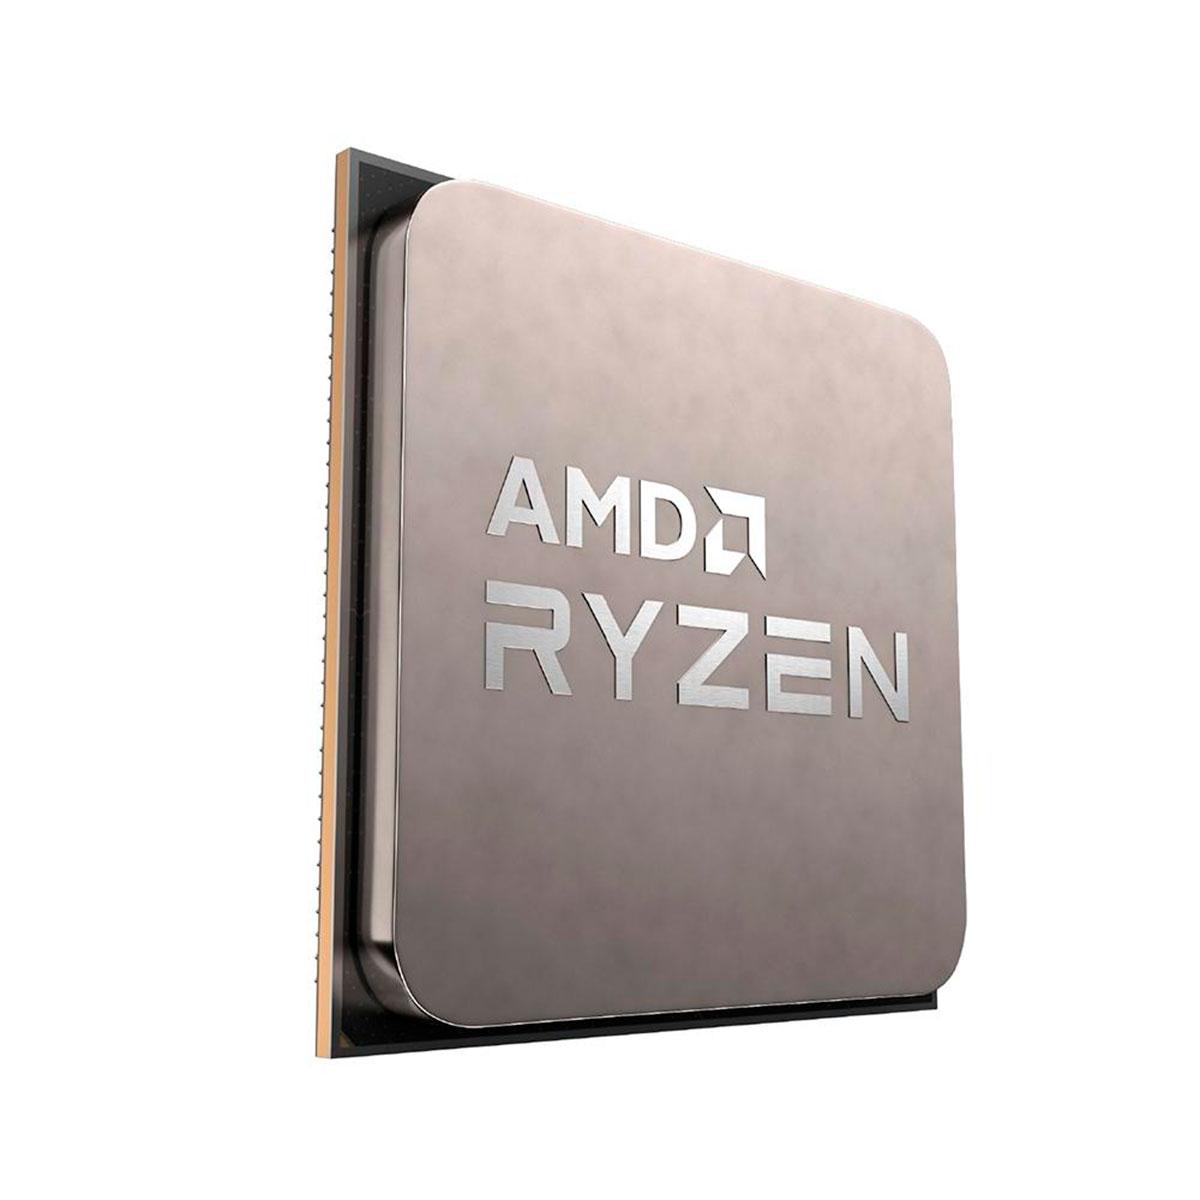 Processador AMD Ryzen 7 5700G, 3.8GHz (4.6GHz Max Boost), Cache 16MB, AM4 - Video Integrado Vega 8